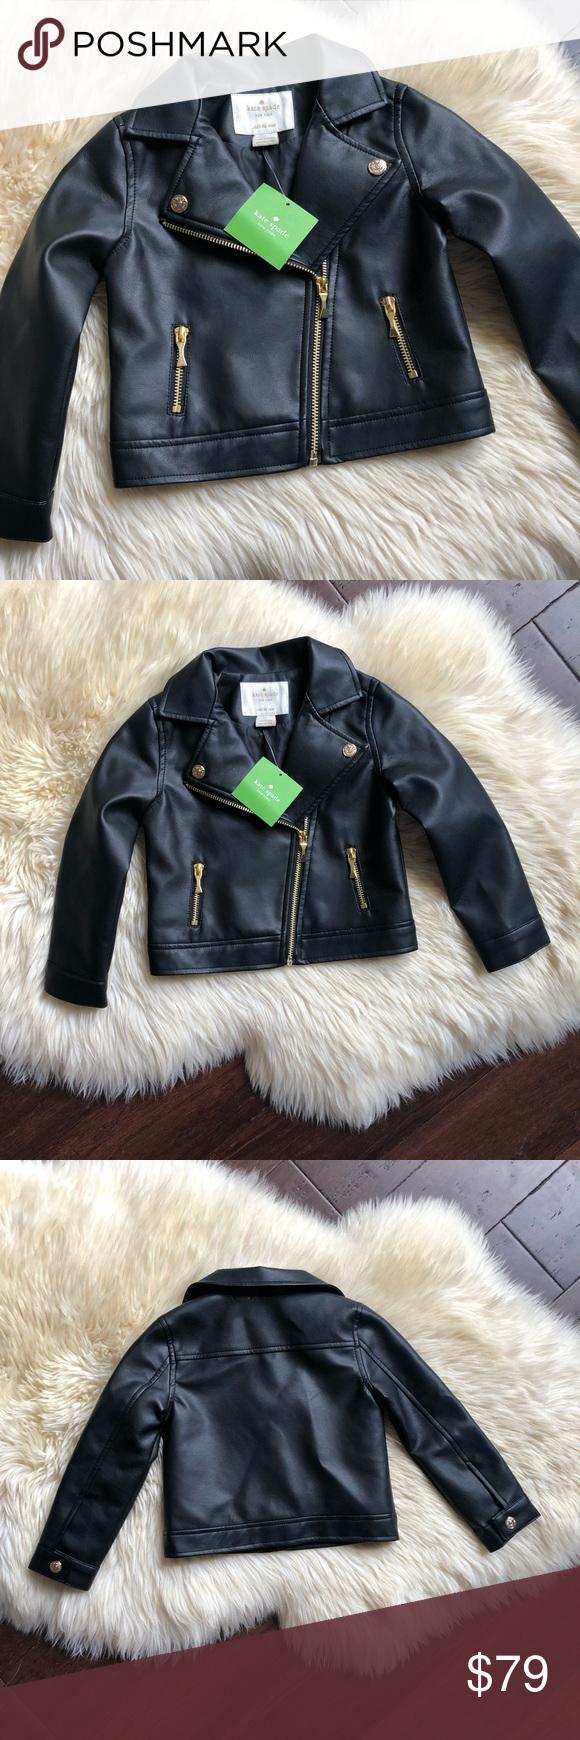 Nwt Kate Spade Toddler Faux Leather Moto Jacket 3t Faux Leather Moto Jacket Kate Spade Jacket Moto Jacket [ 1740 x 580 Pixel ]